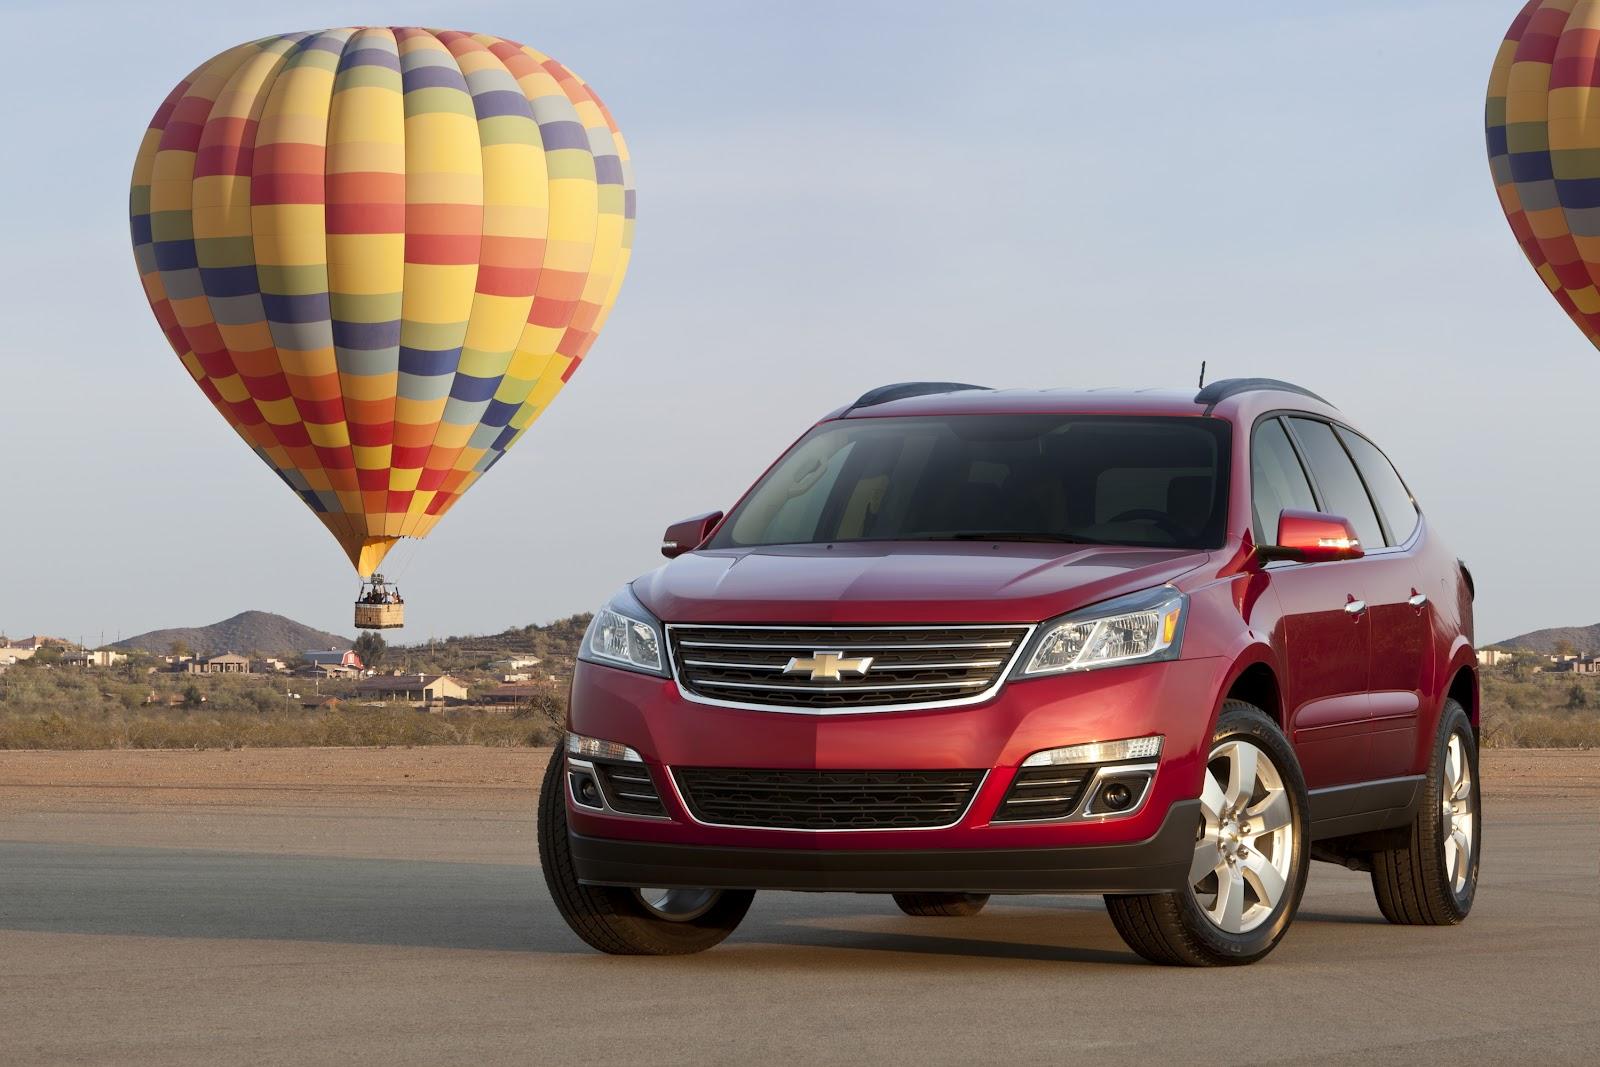 chevrolet - 2009 - [Chevrolet] traverse 2013+chevrolet+traverse